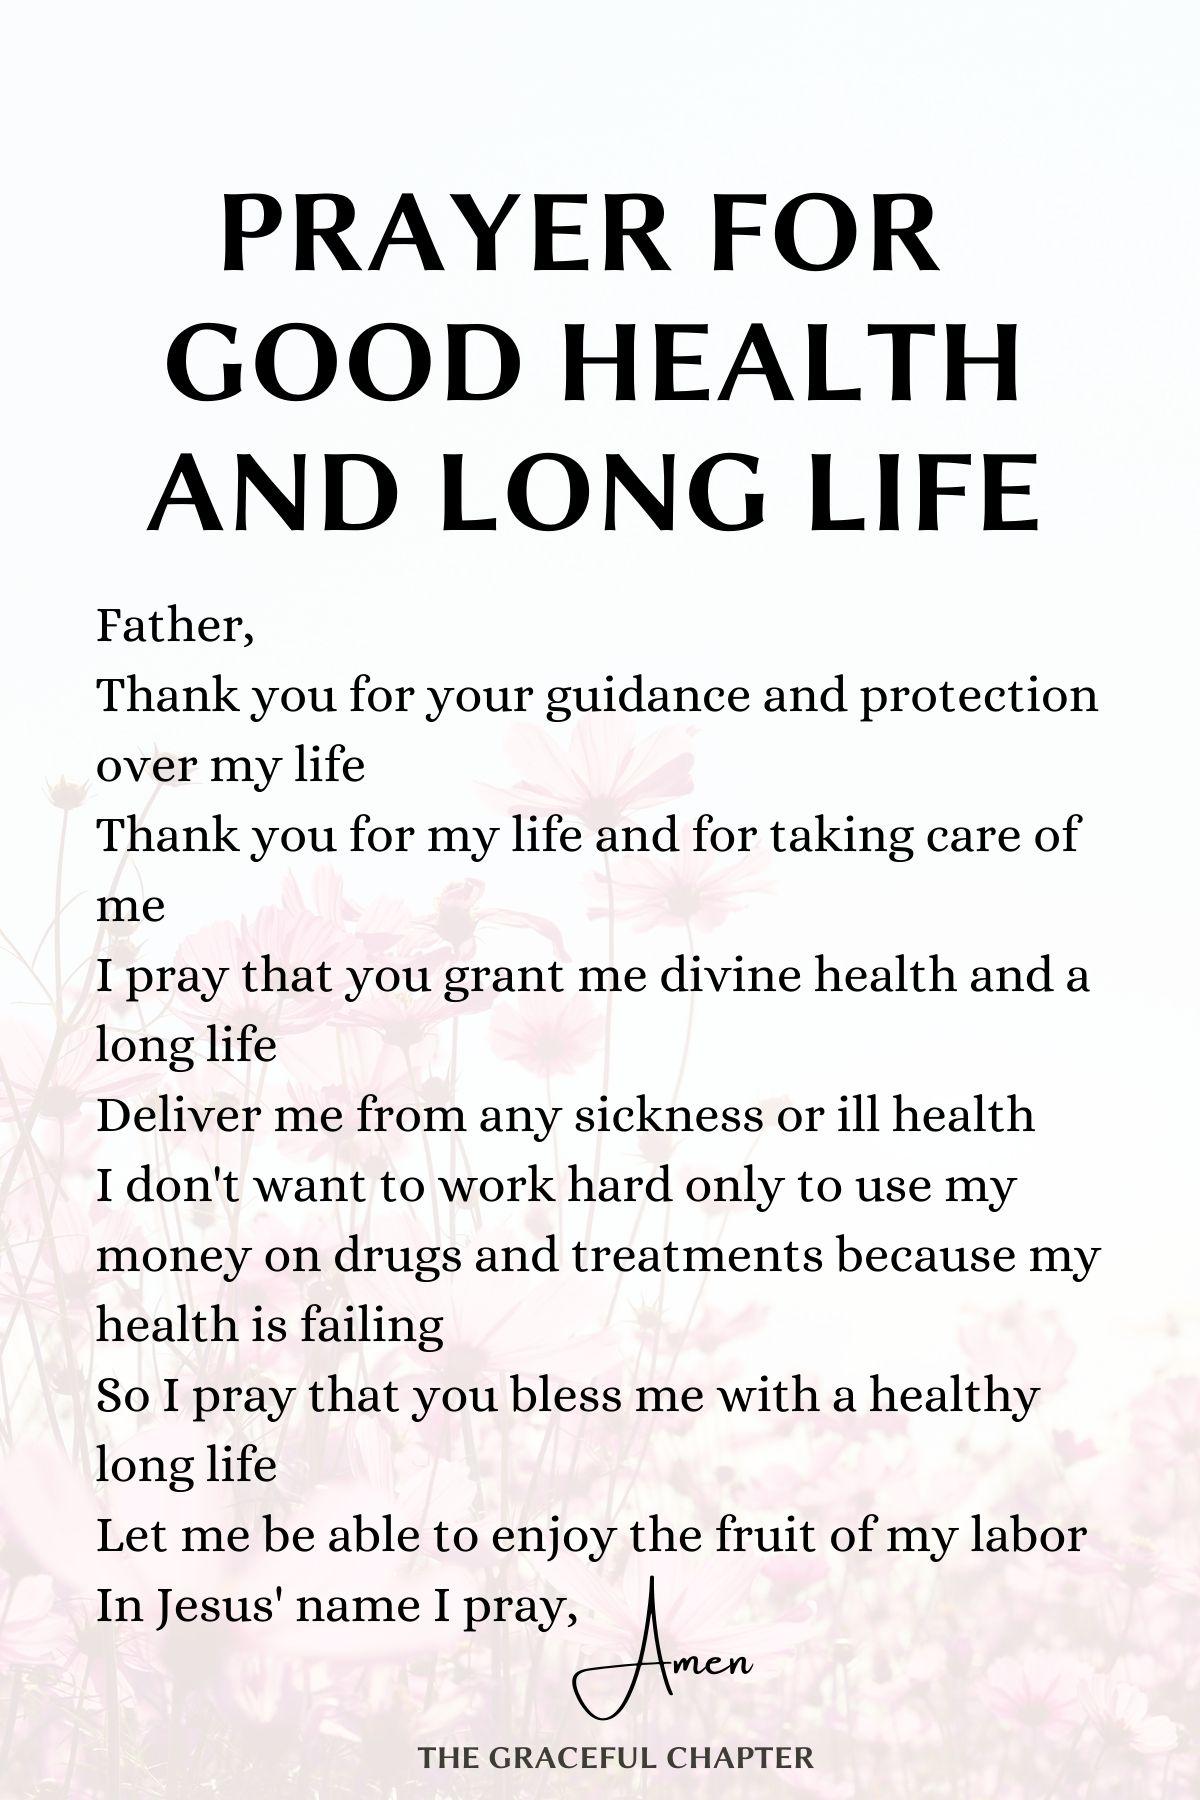 Prayer for good health and long life